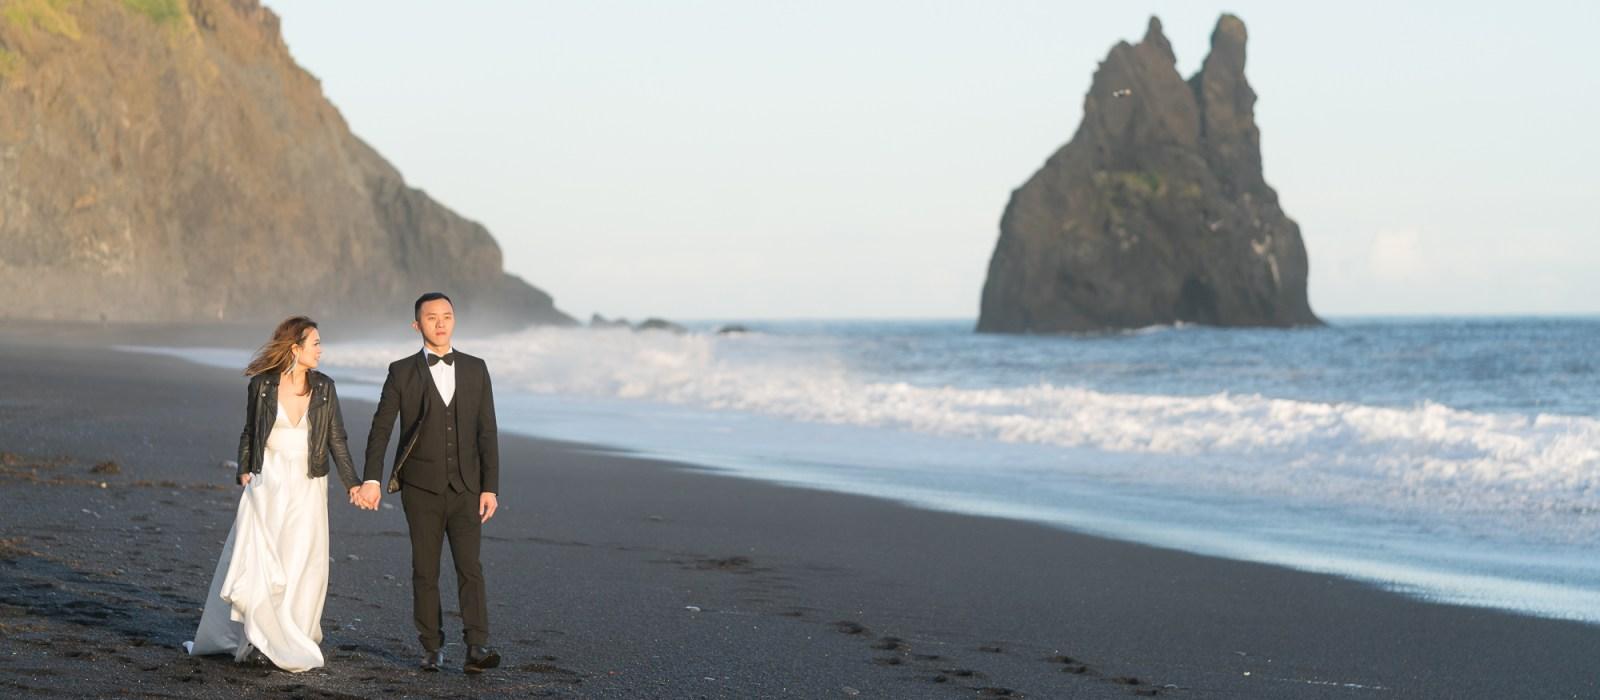 Couple walking on the Black Sand Beach near Vik, Iceland